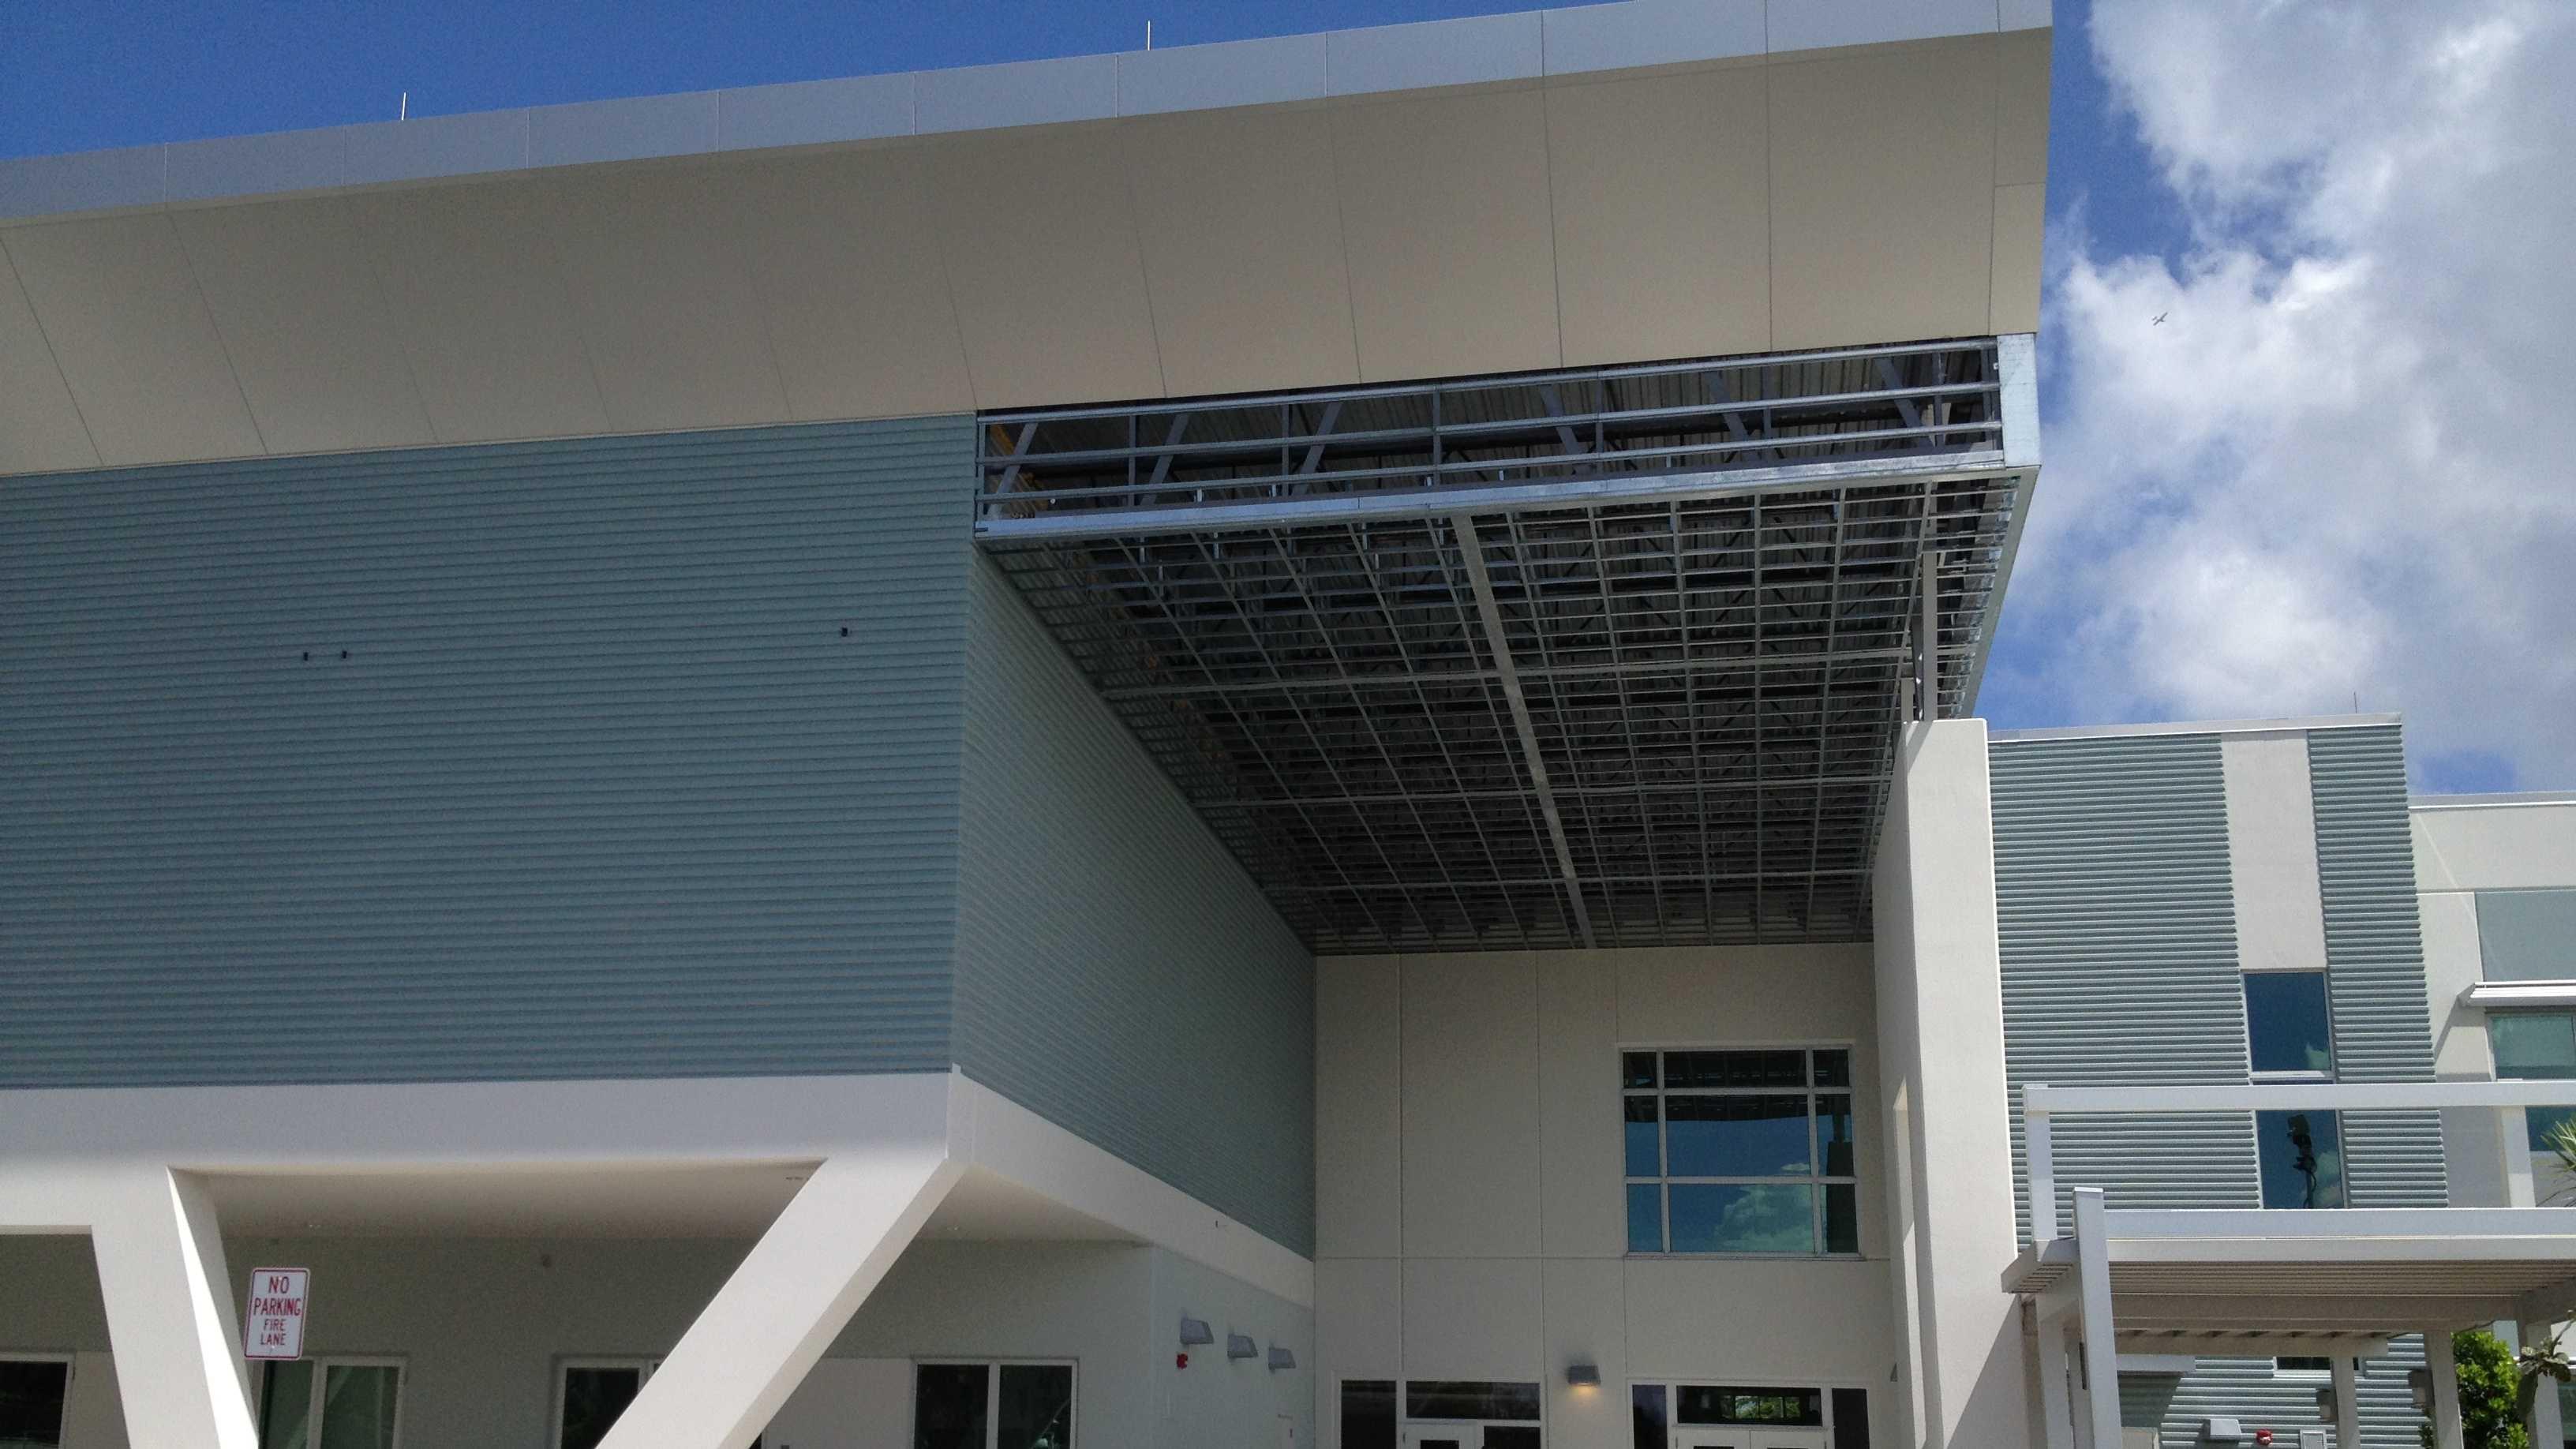 The new Galaxy E3 School in Boynton Beach covers 109,000 square feet.